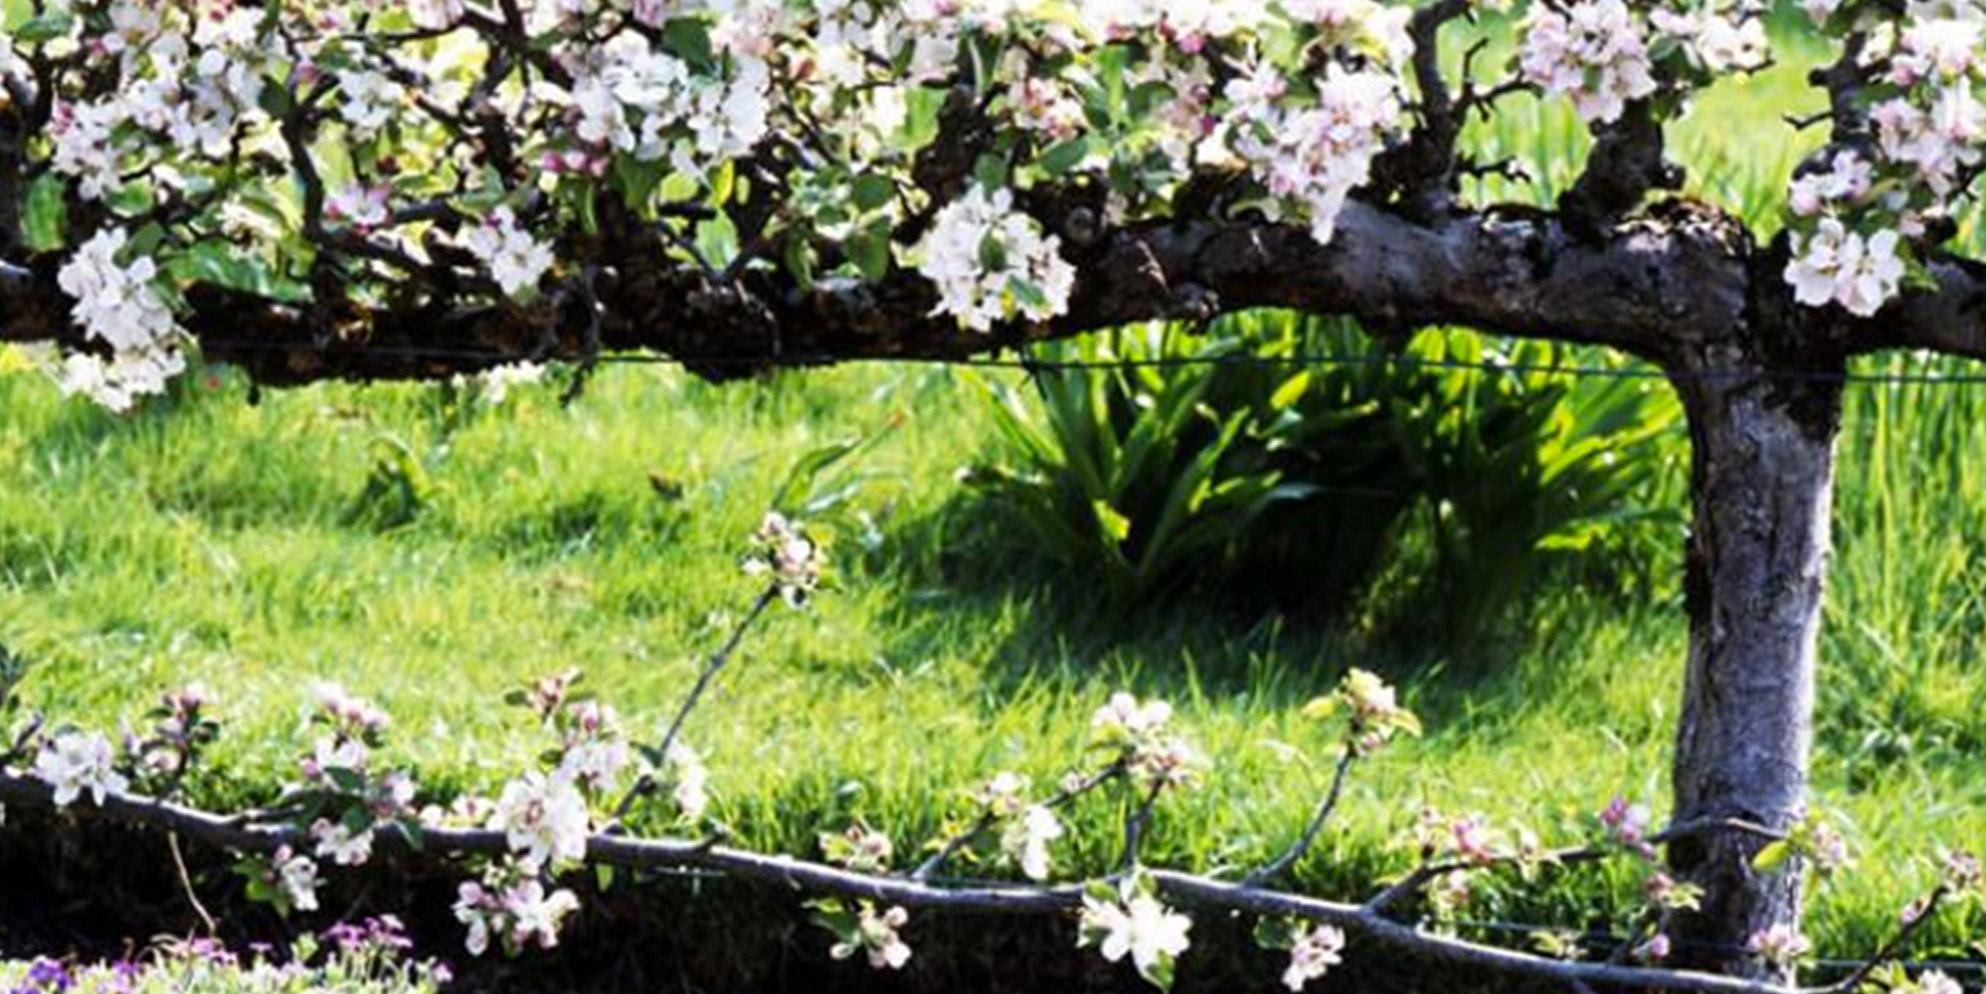 Fondation Claude Monet The Garden In Spring Fondation Claude Monet